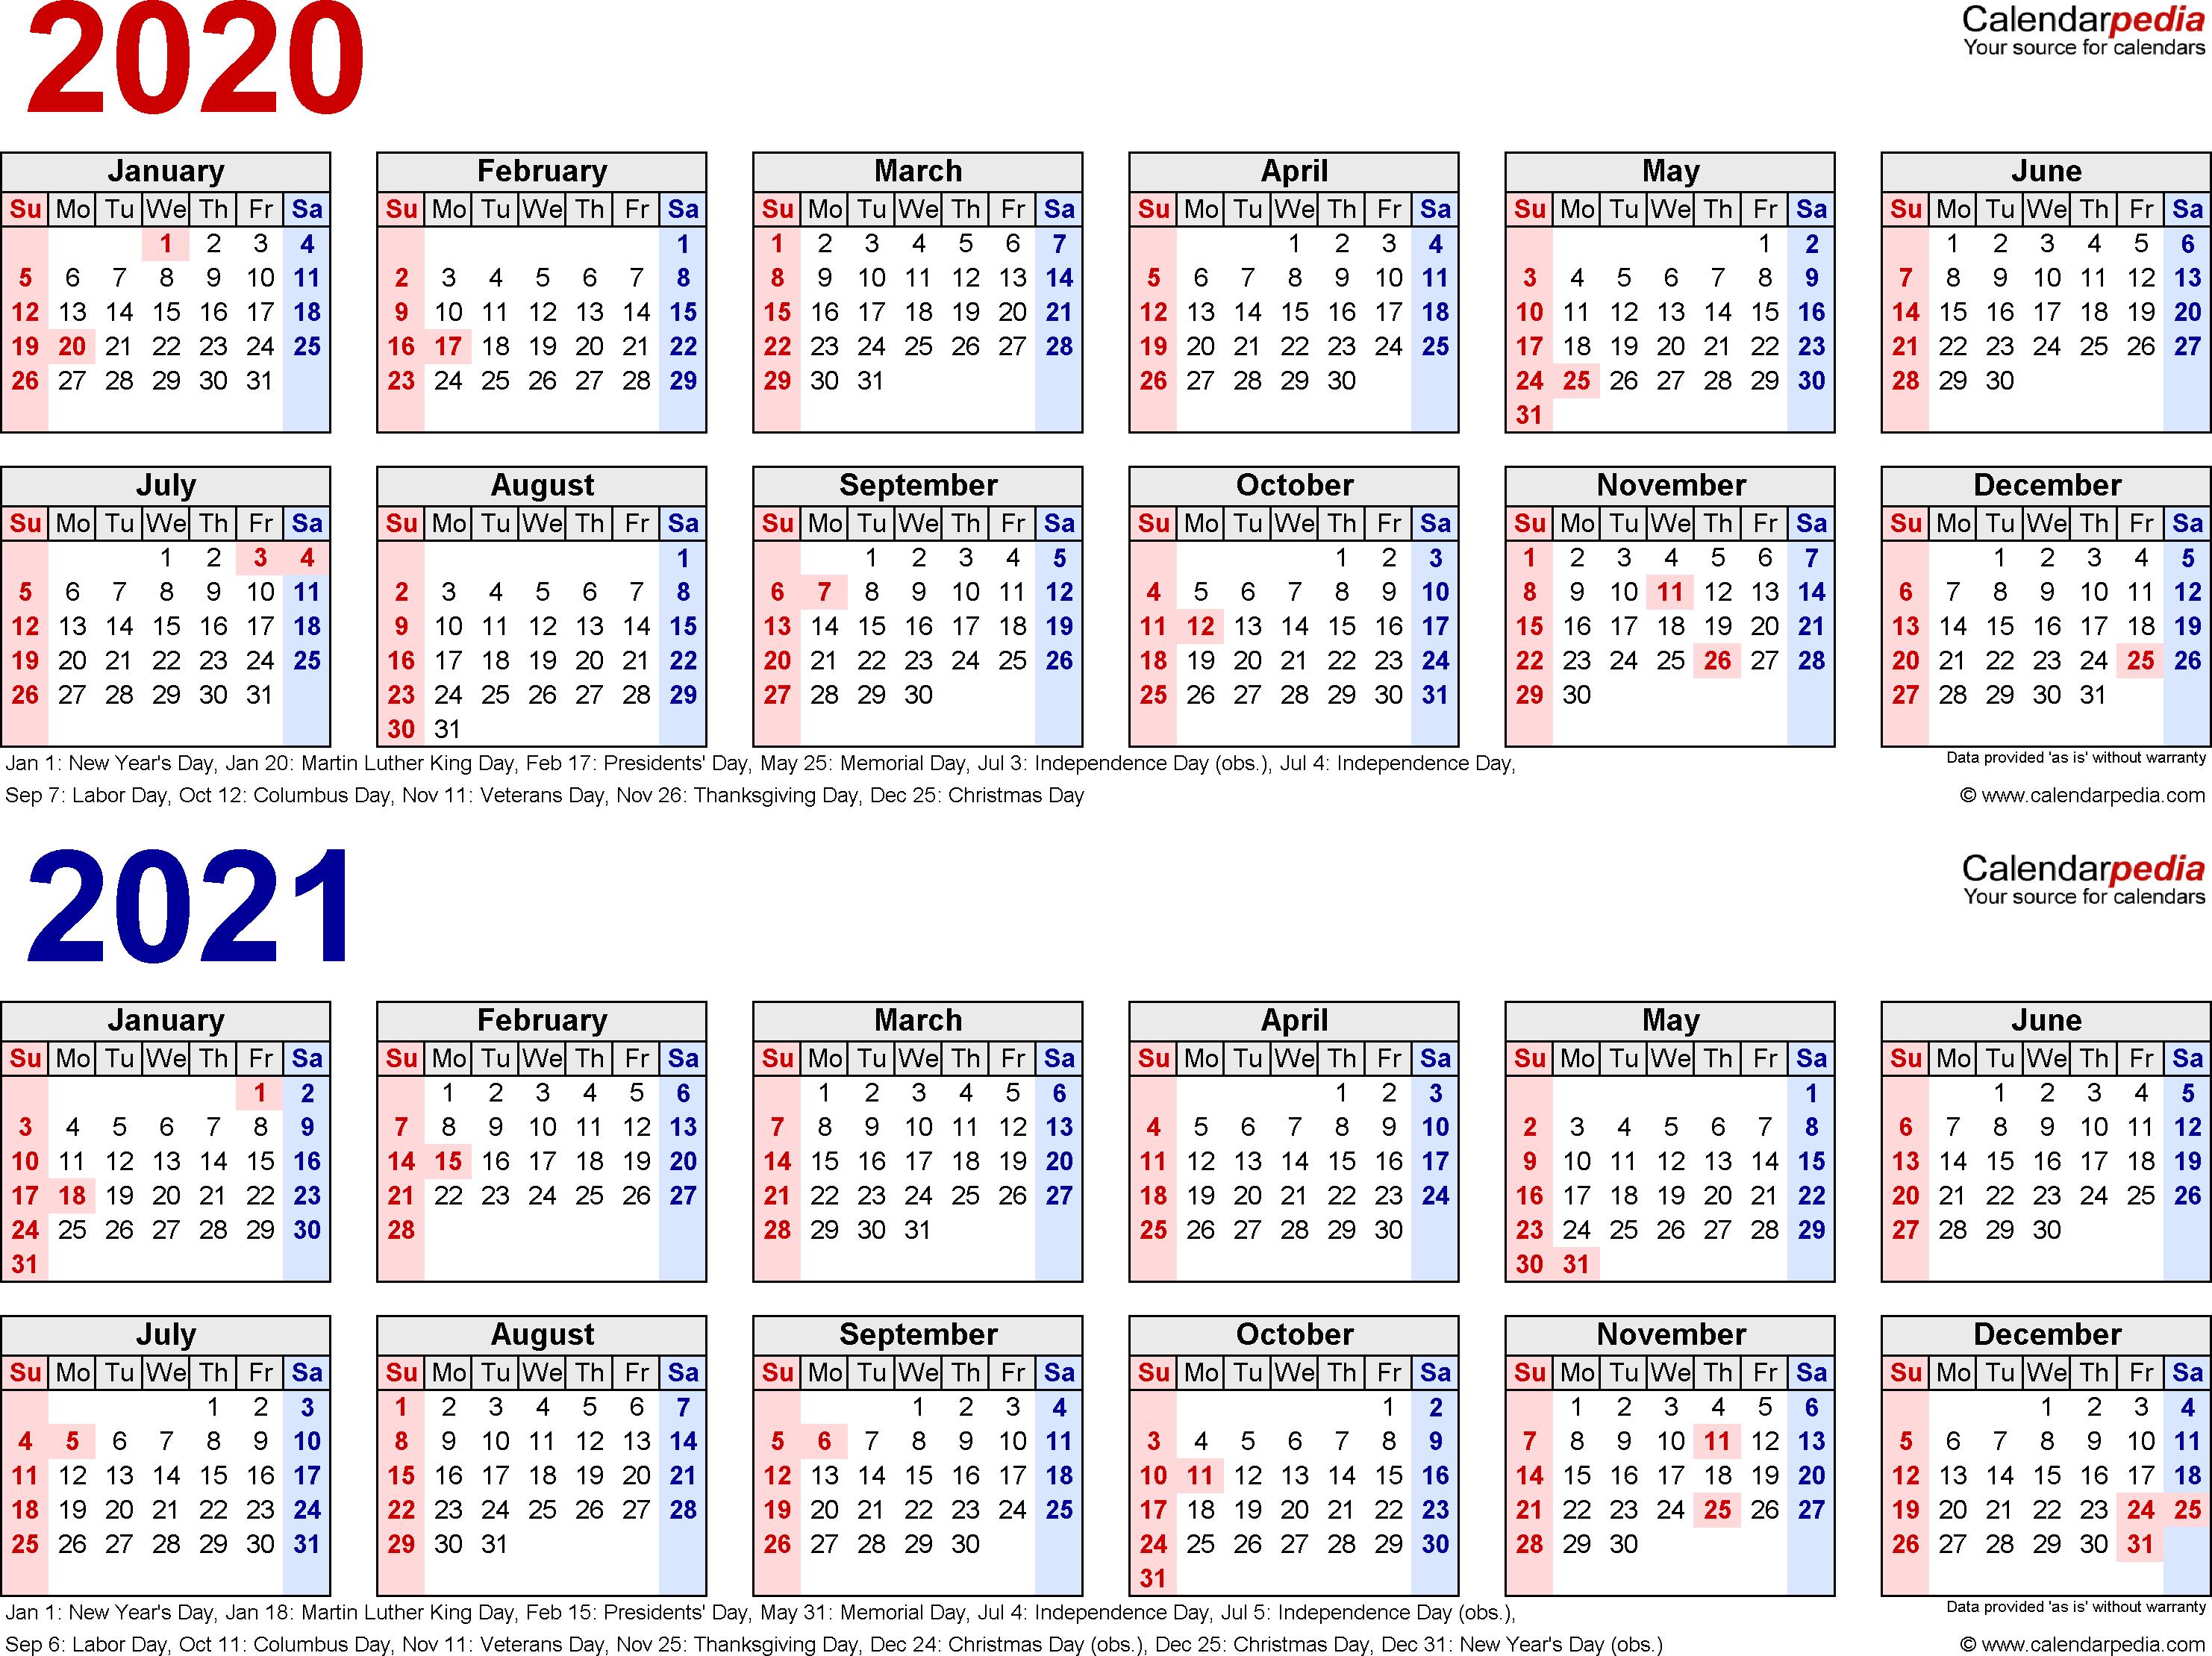 2 Year Calendar - Wpa.wpart.co for 2 Year Calendar Template 2020 2021